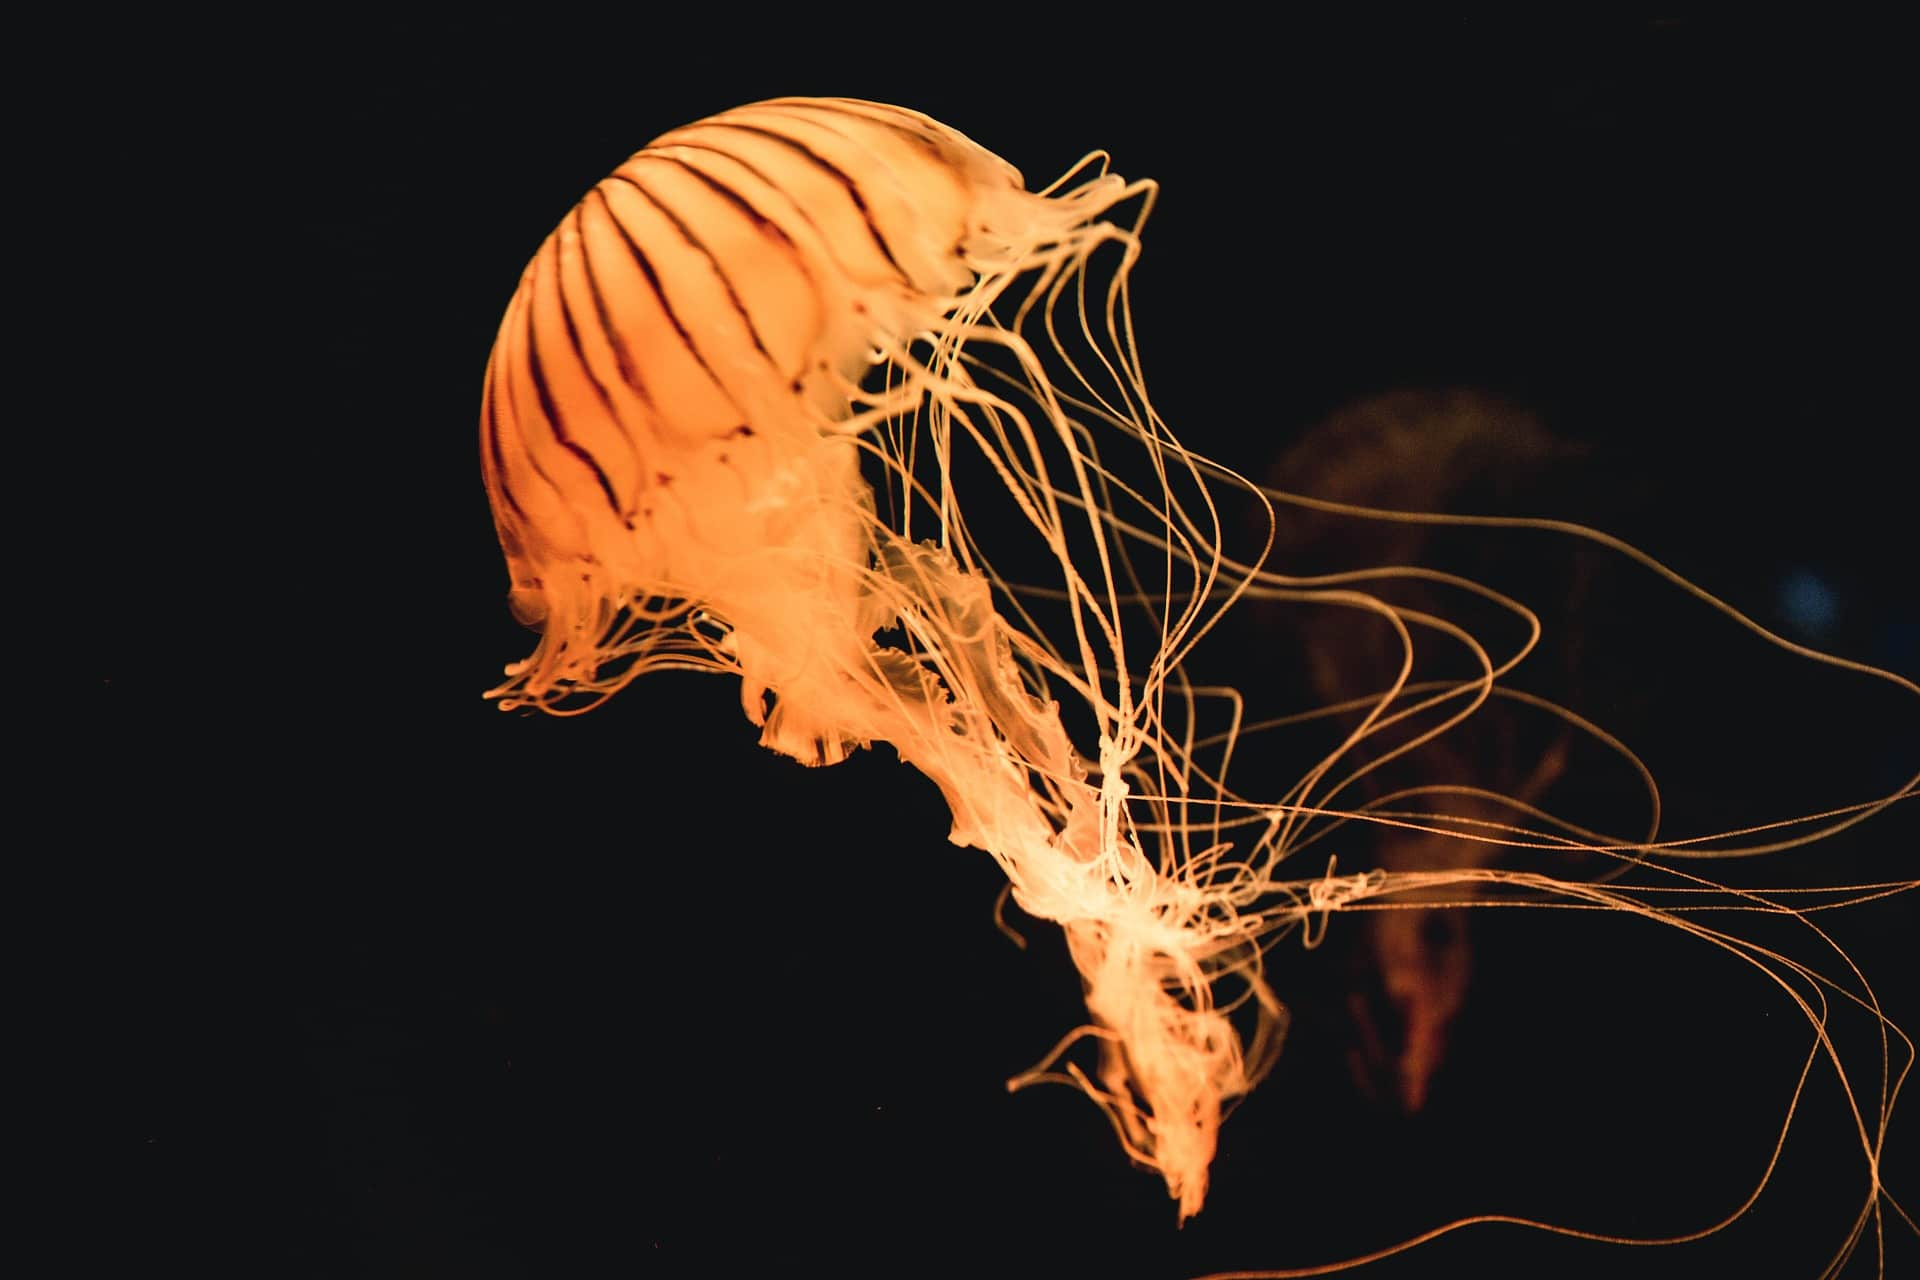 Cómo son las medusas